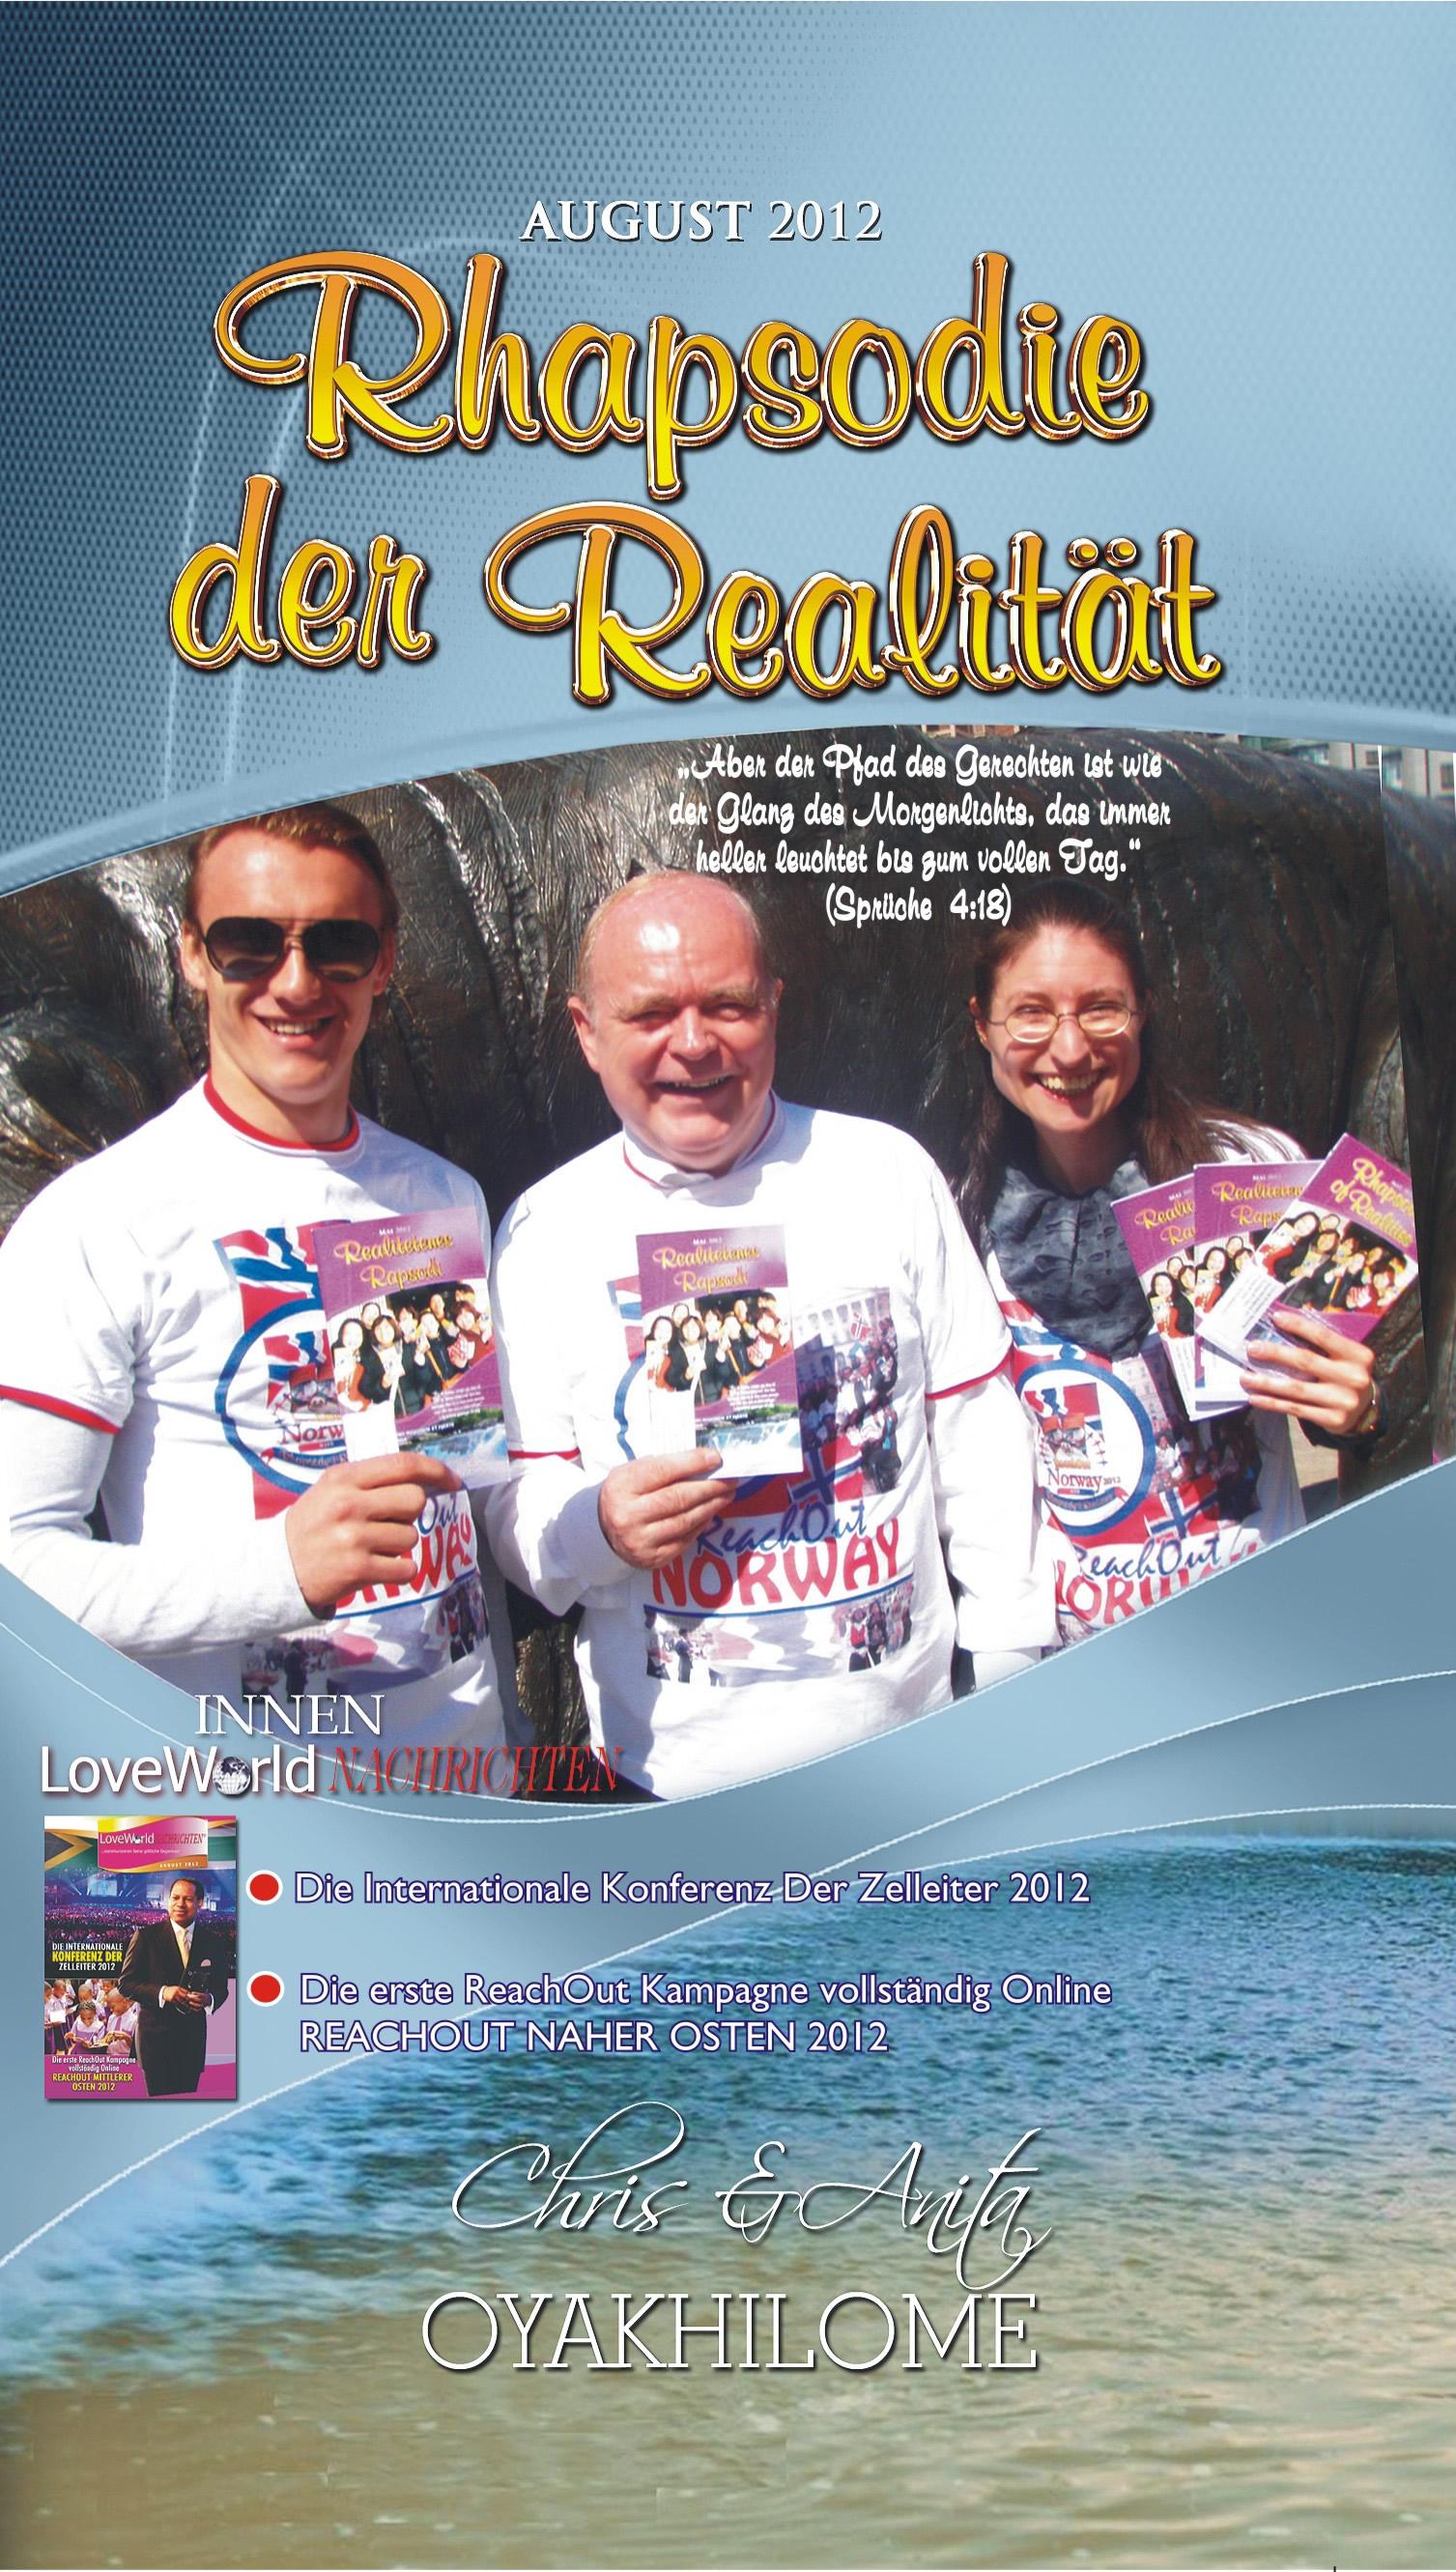 Pastor Chris and Anita Oyakhilome - Rhapsody Of Realities August 2012 German Edition